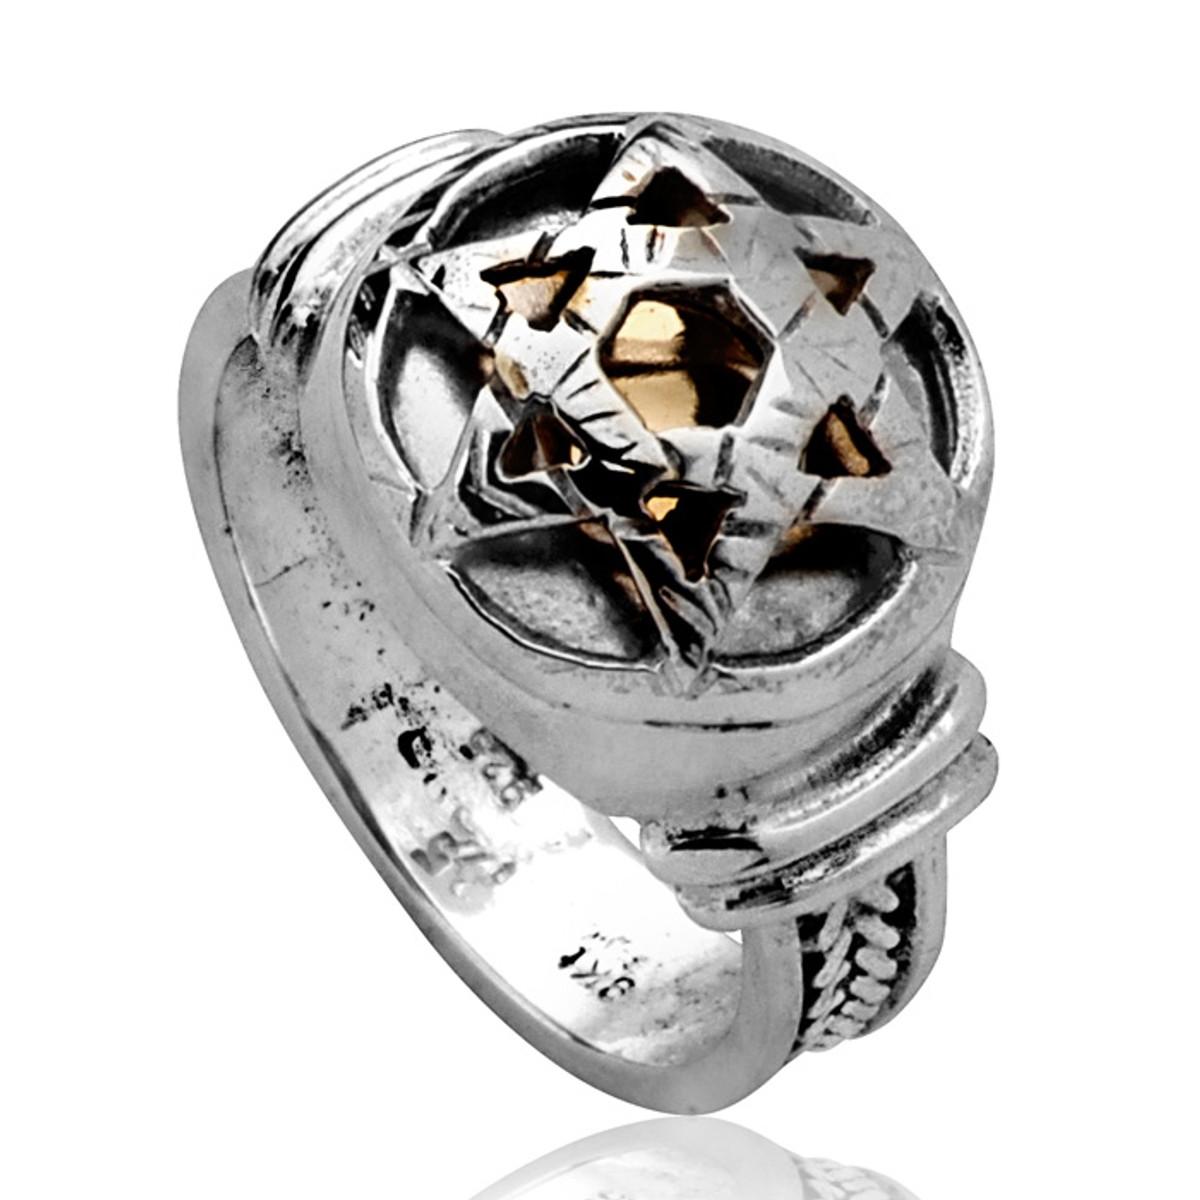 5 Metal Evil Eye Ring With Star Of David